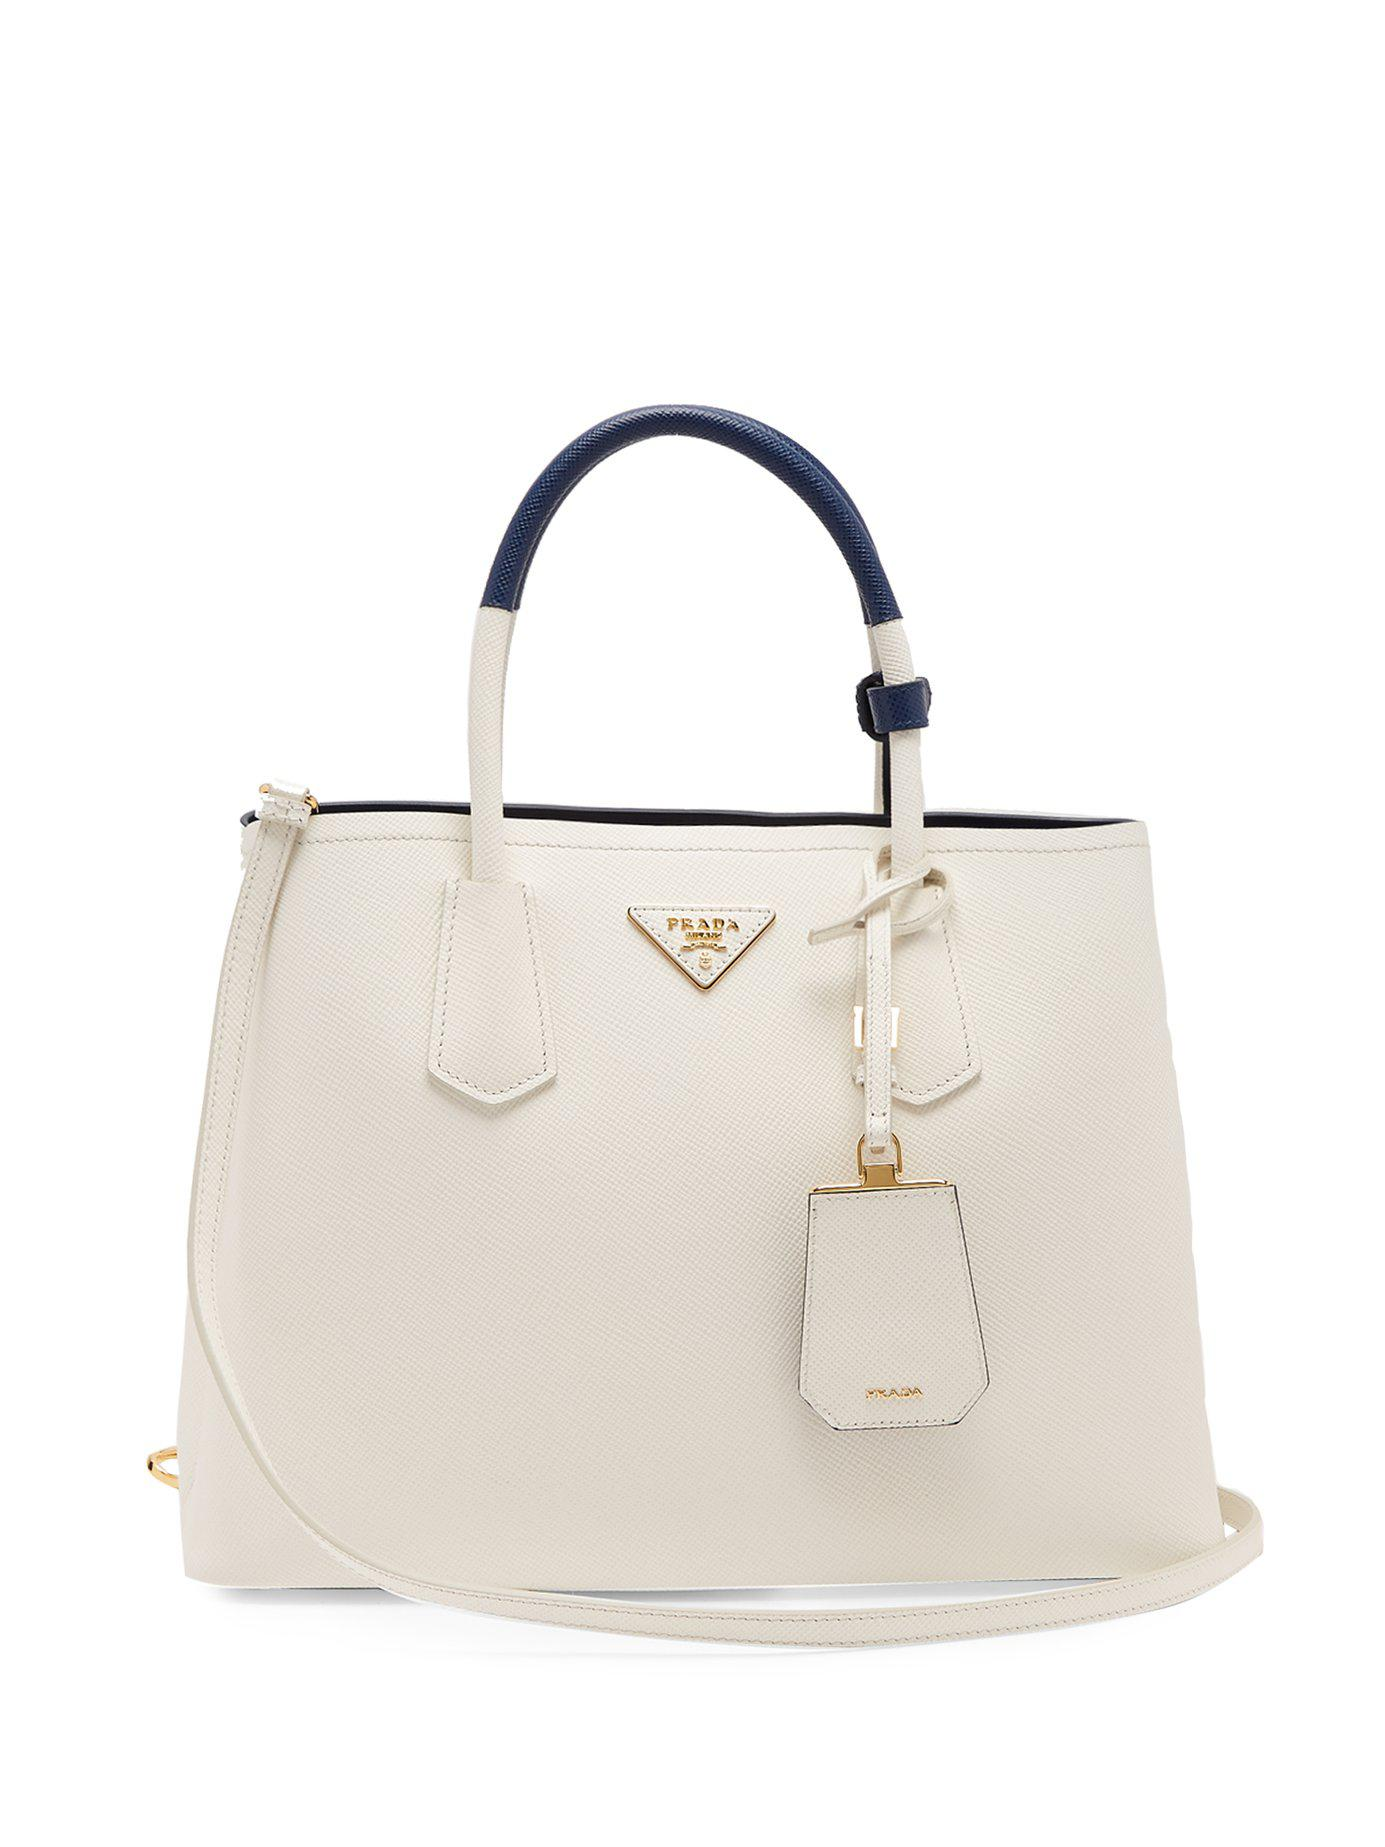 Prada. Women s Double Saffiano Leather Bag c0588b0ec243b